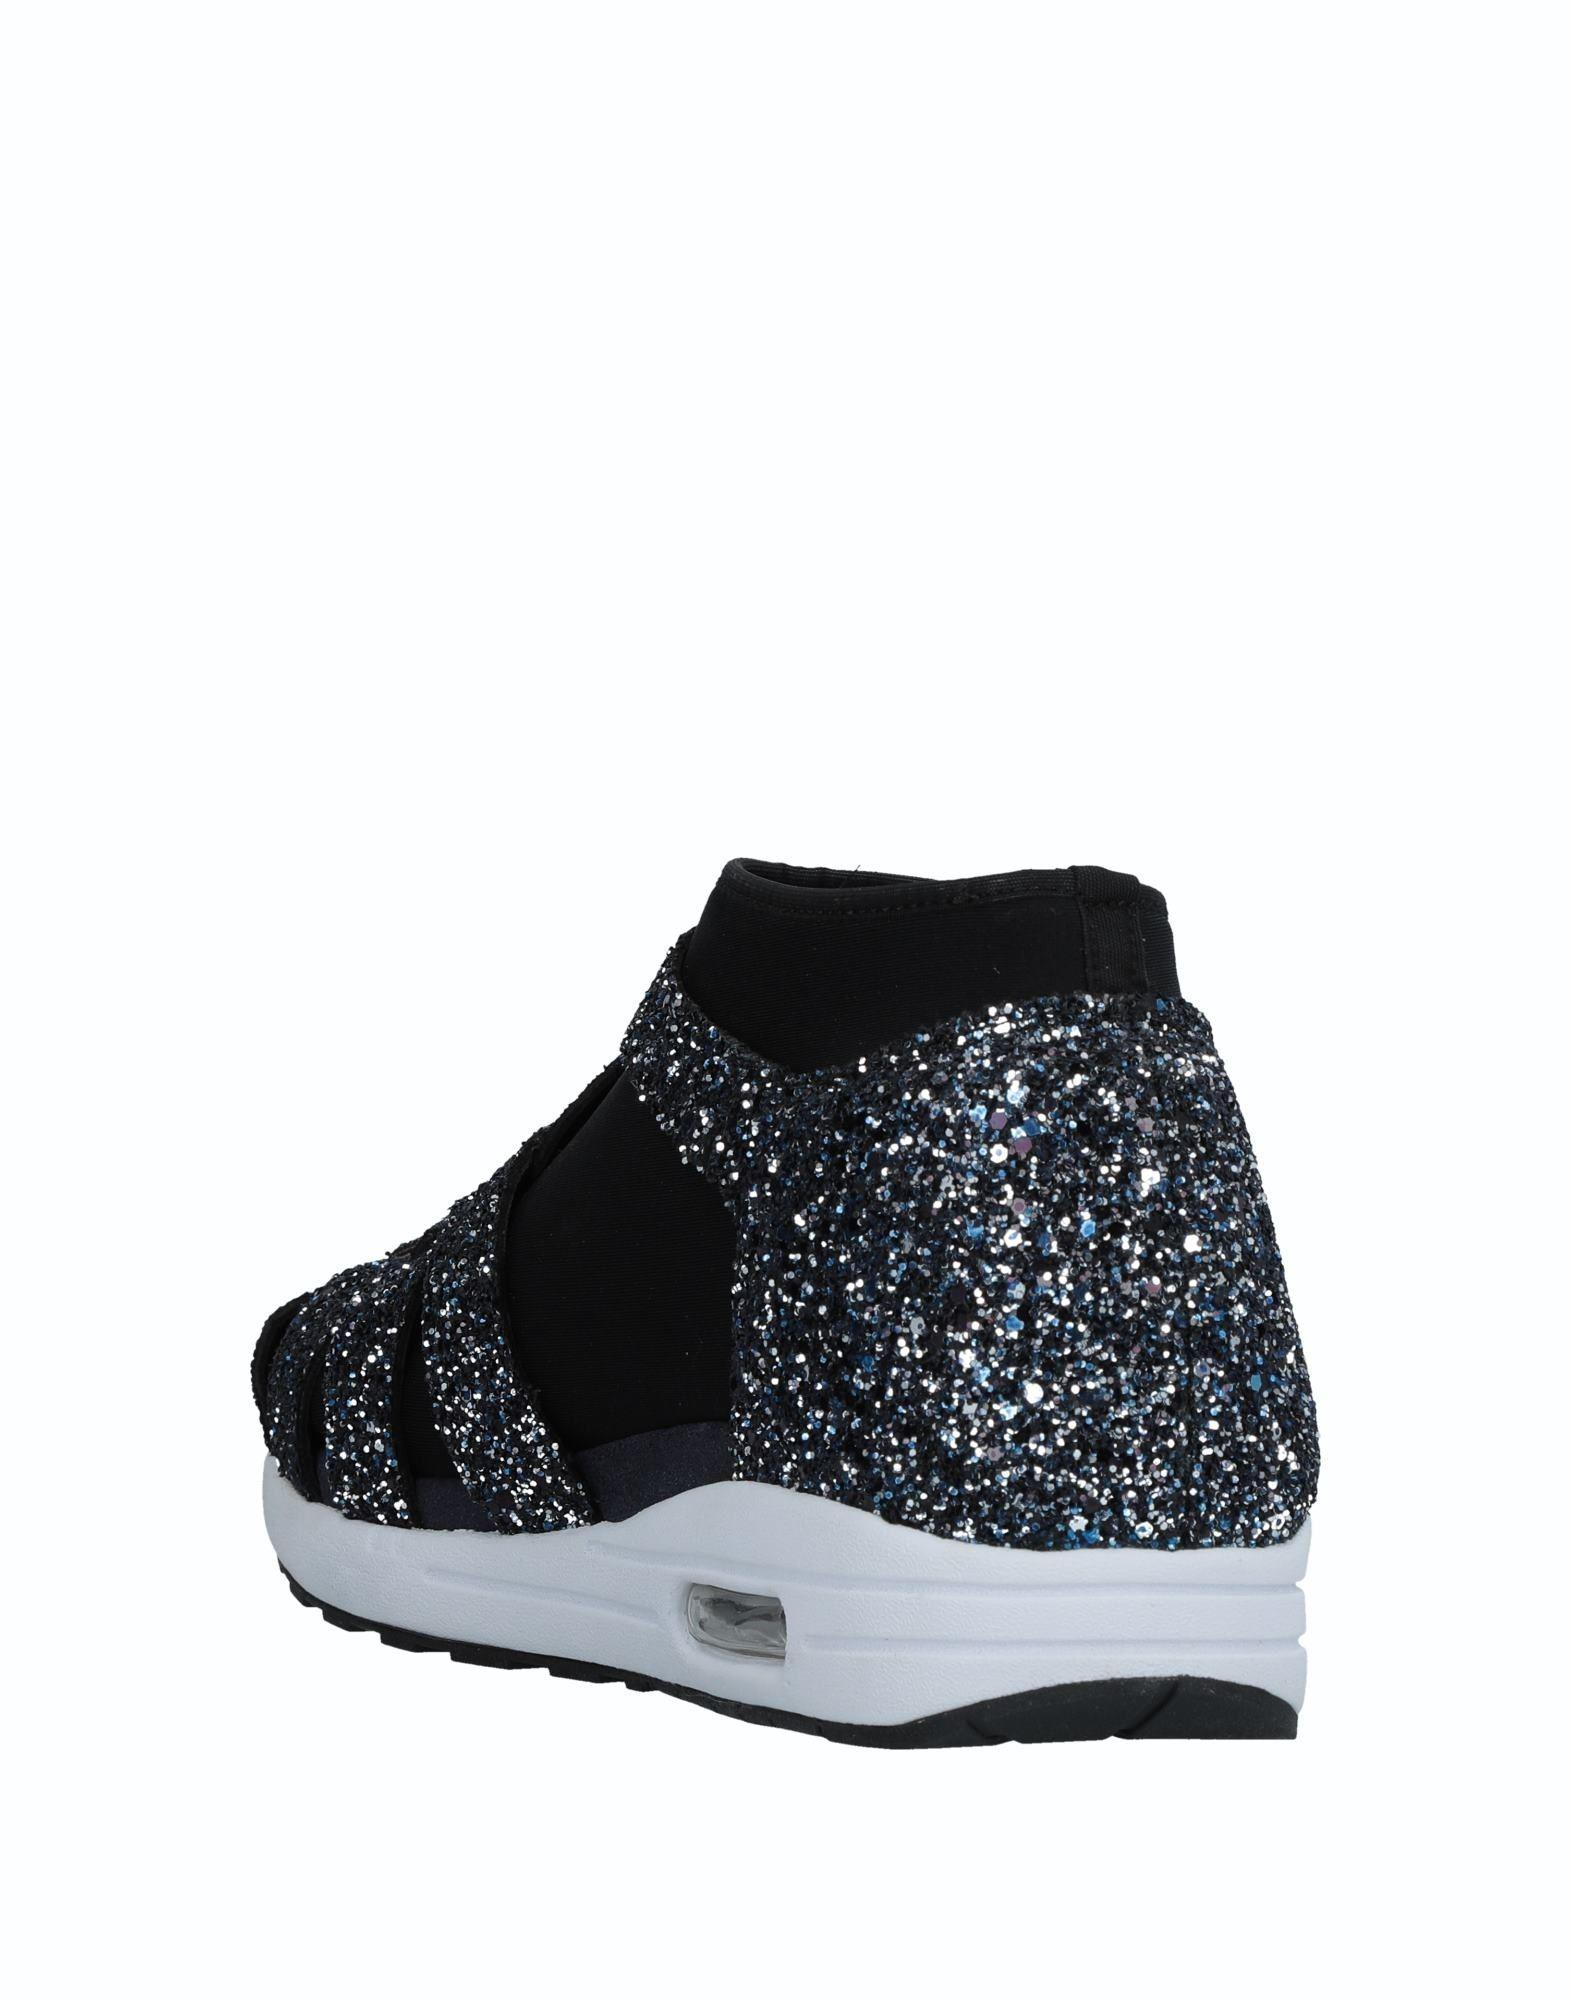 Susana Traça Leather High-tops & Sneakers in Dark Blue (Blue)